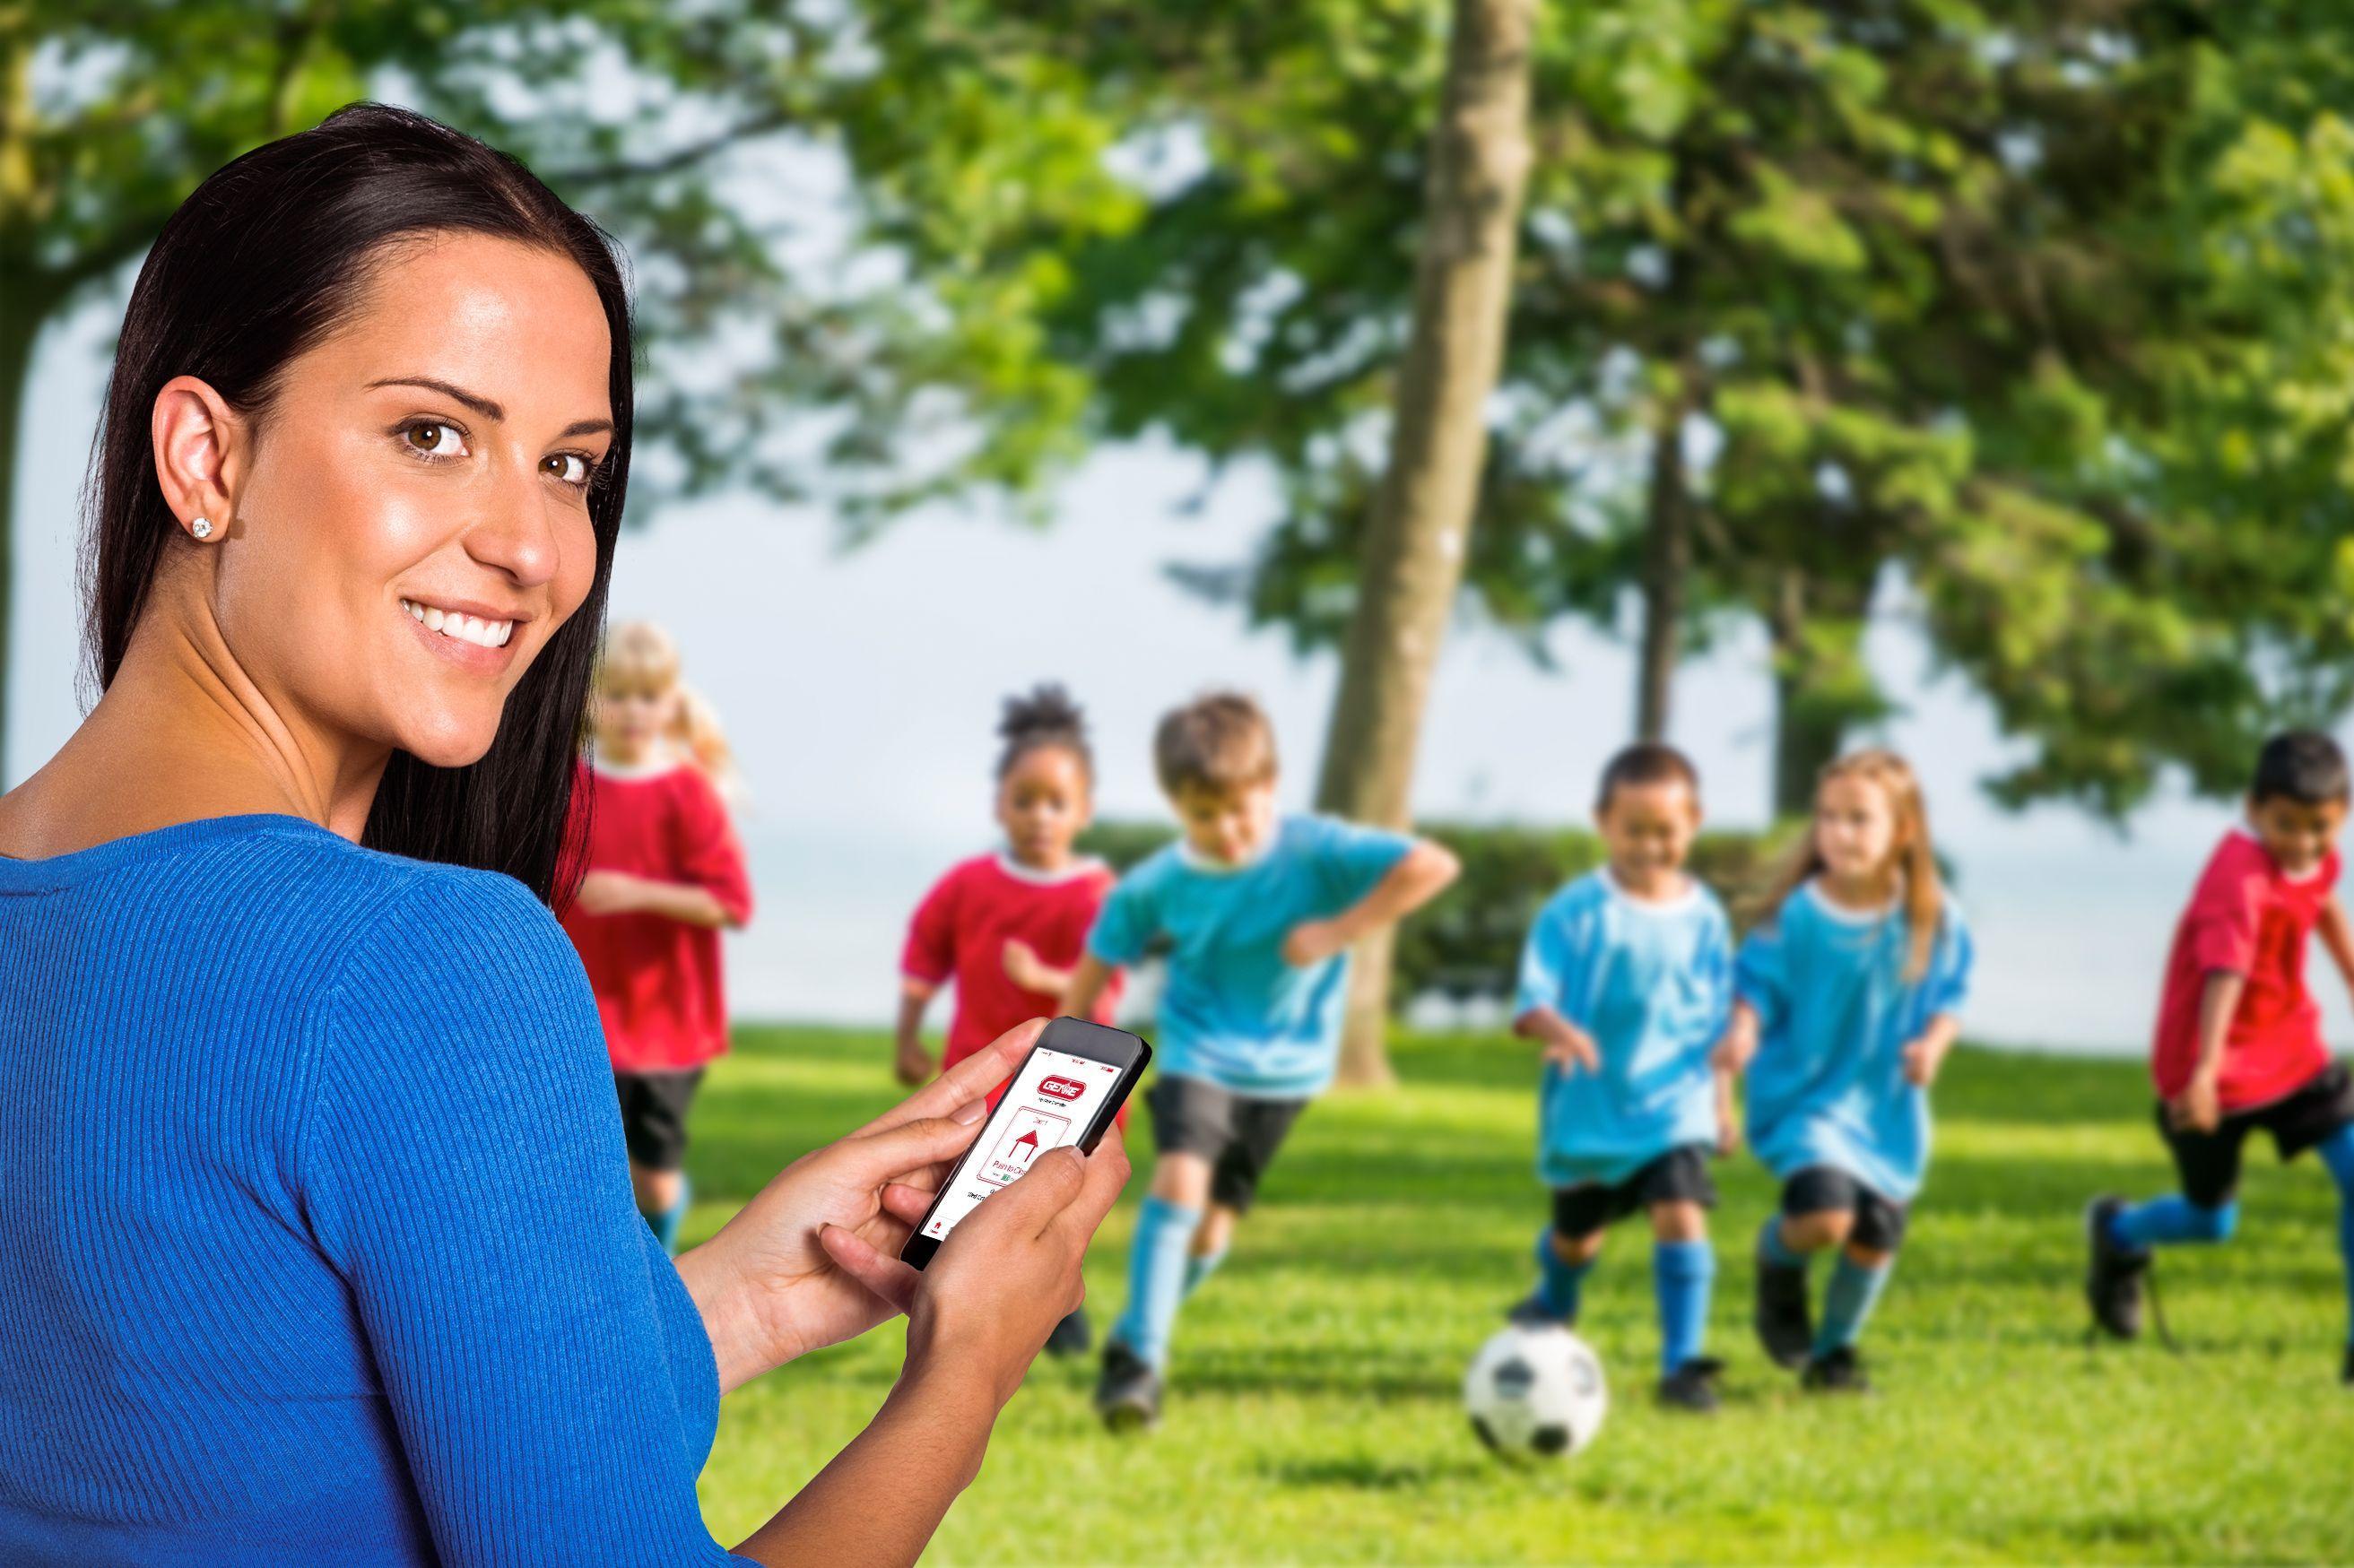 hero-image-soccer-mom.jpeg?mtime=20200608132205#asset:18058